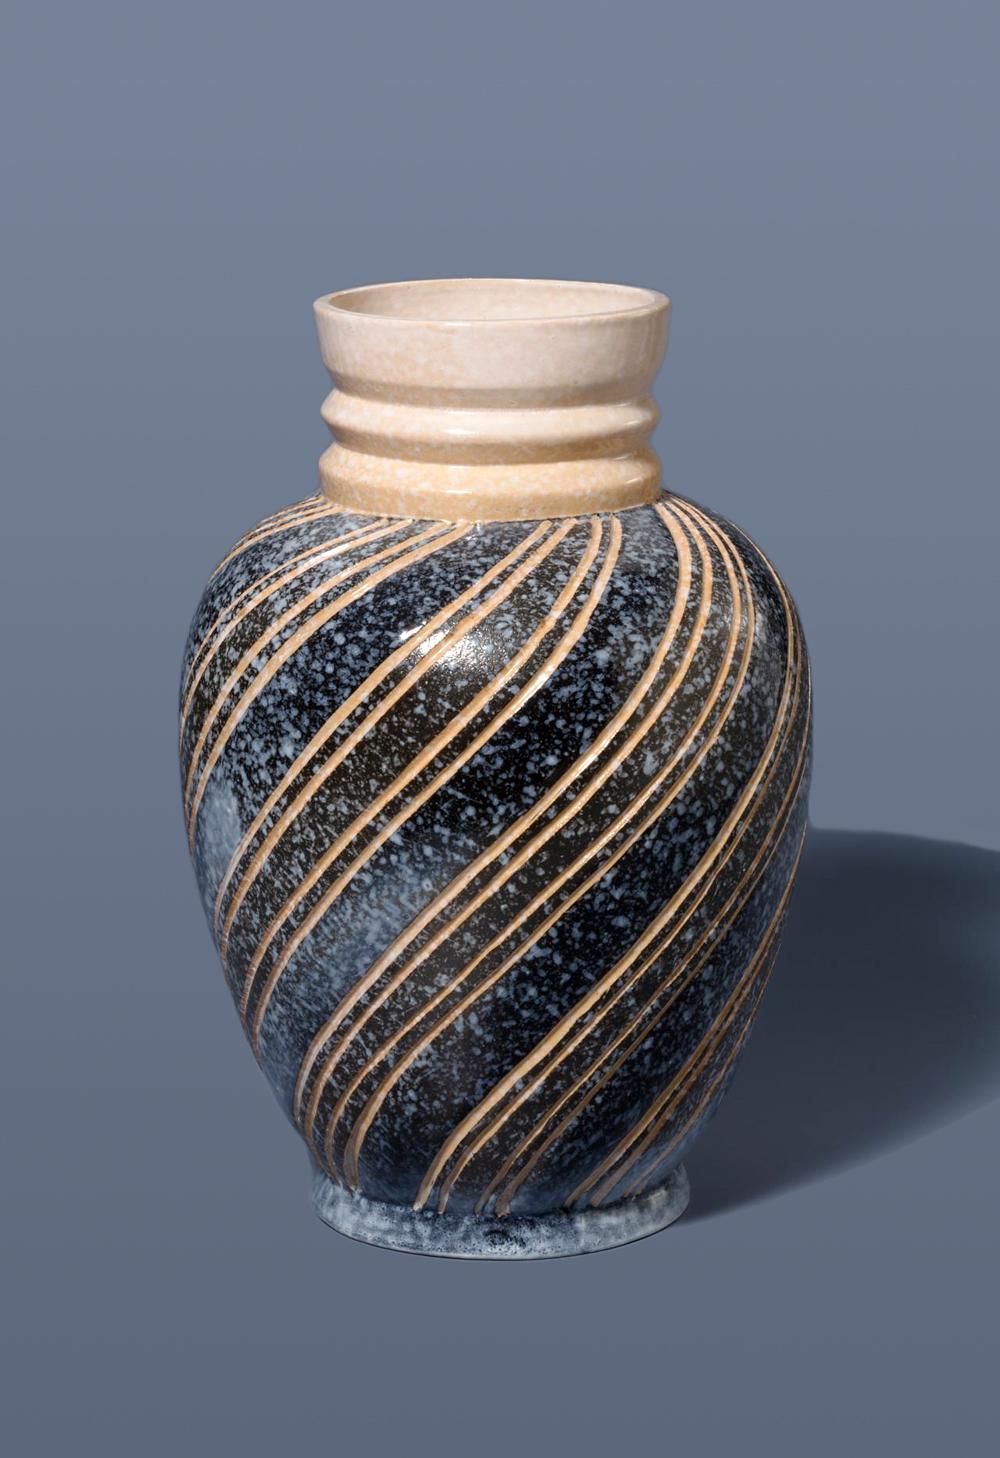 Generous Vintage Square Textured Davidsons Luna Vase Glass British